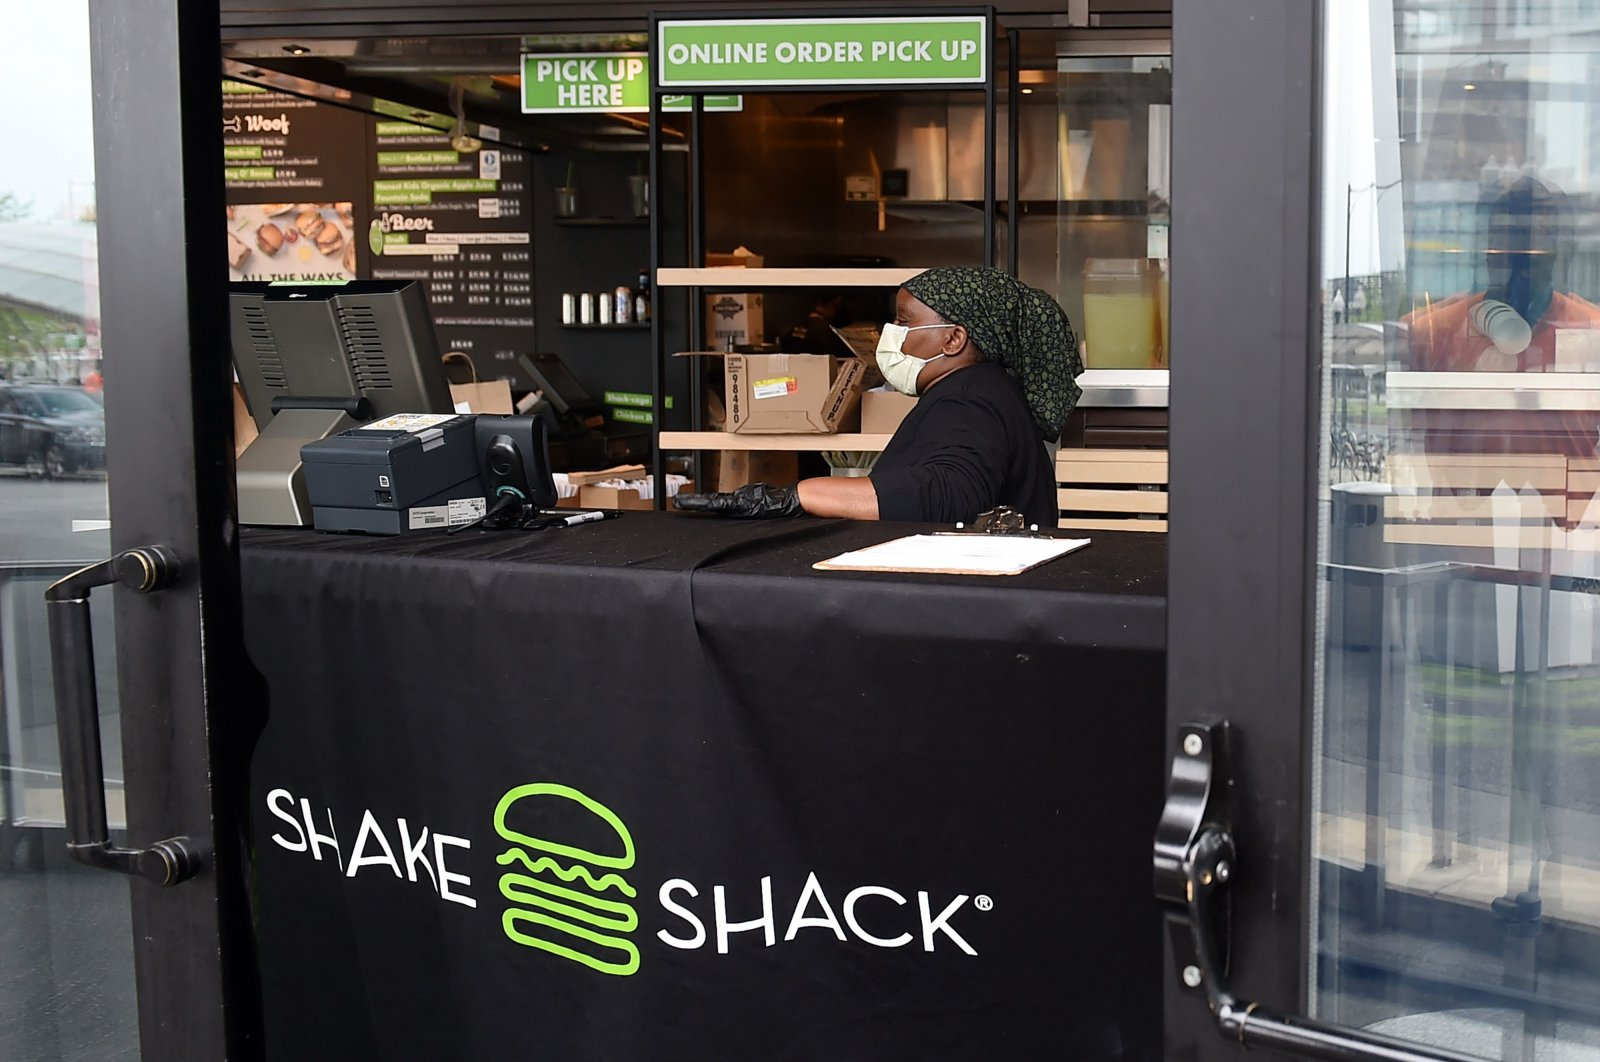 A Shake Shack employee wears a masks as she prepares food orders for pickup during the coronavirus pandemic, in Arlington, Virginia, U.S., April 20, 2020. (AFP Photo)